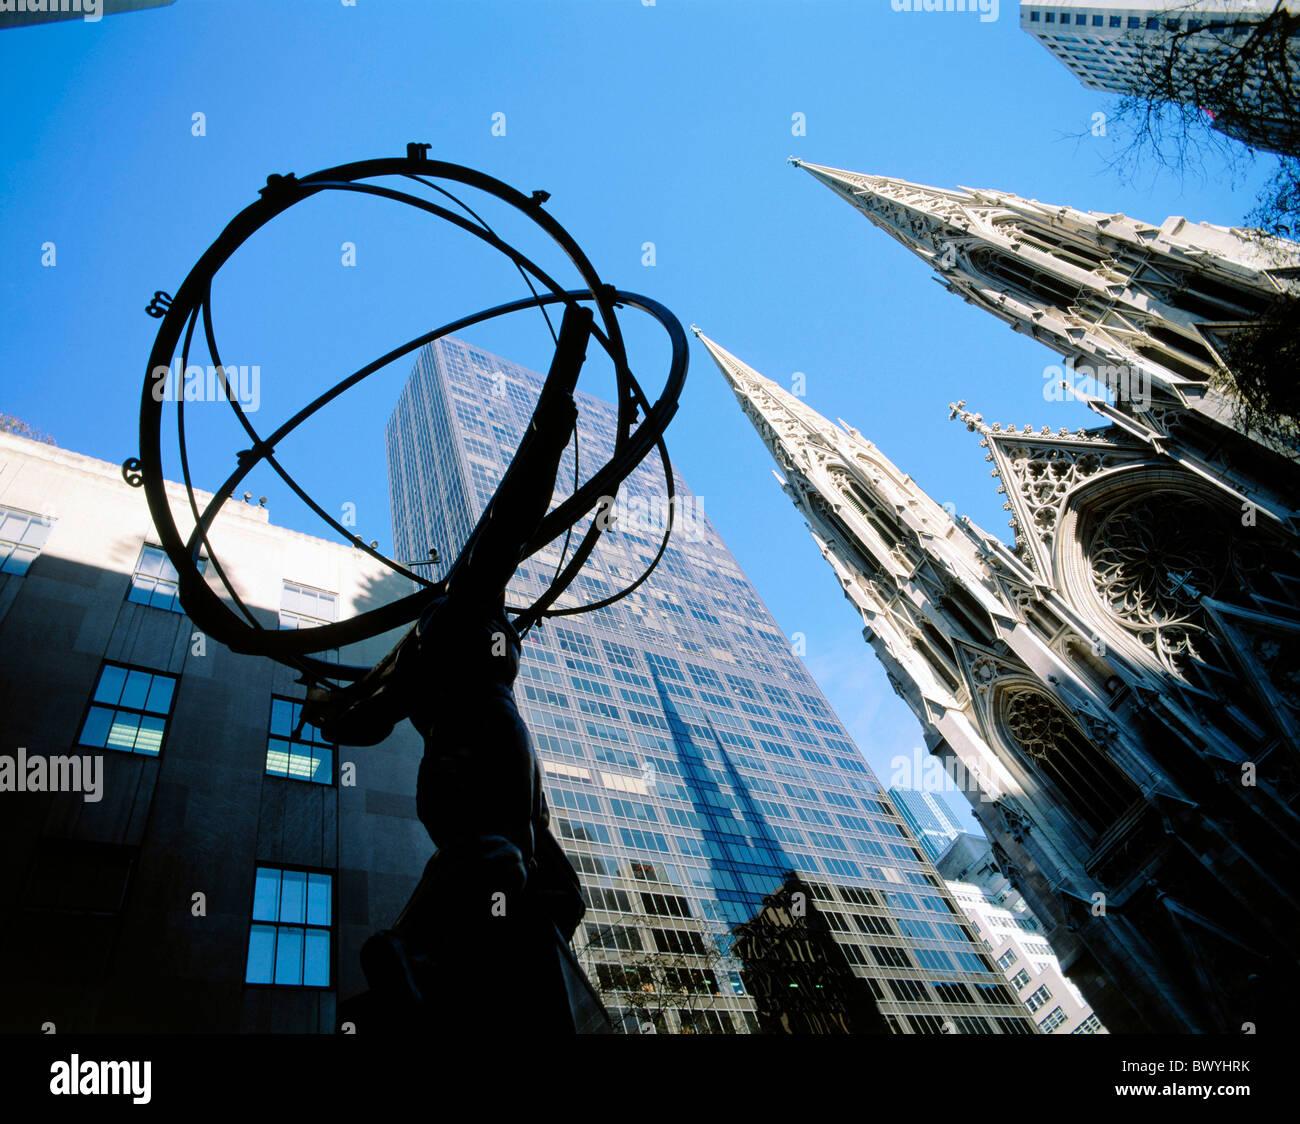 Atlas-Statue Übersicht New York St. Patrick Kathedrale USA Nordamerika Hochhaus Wohnblock Stockbild